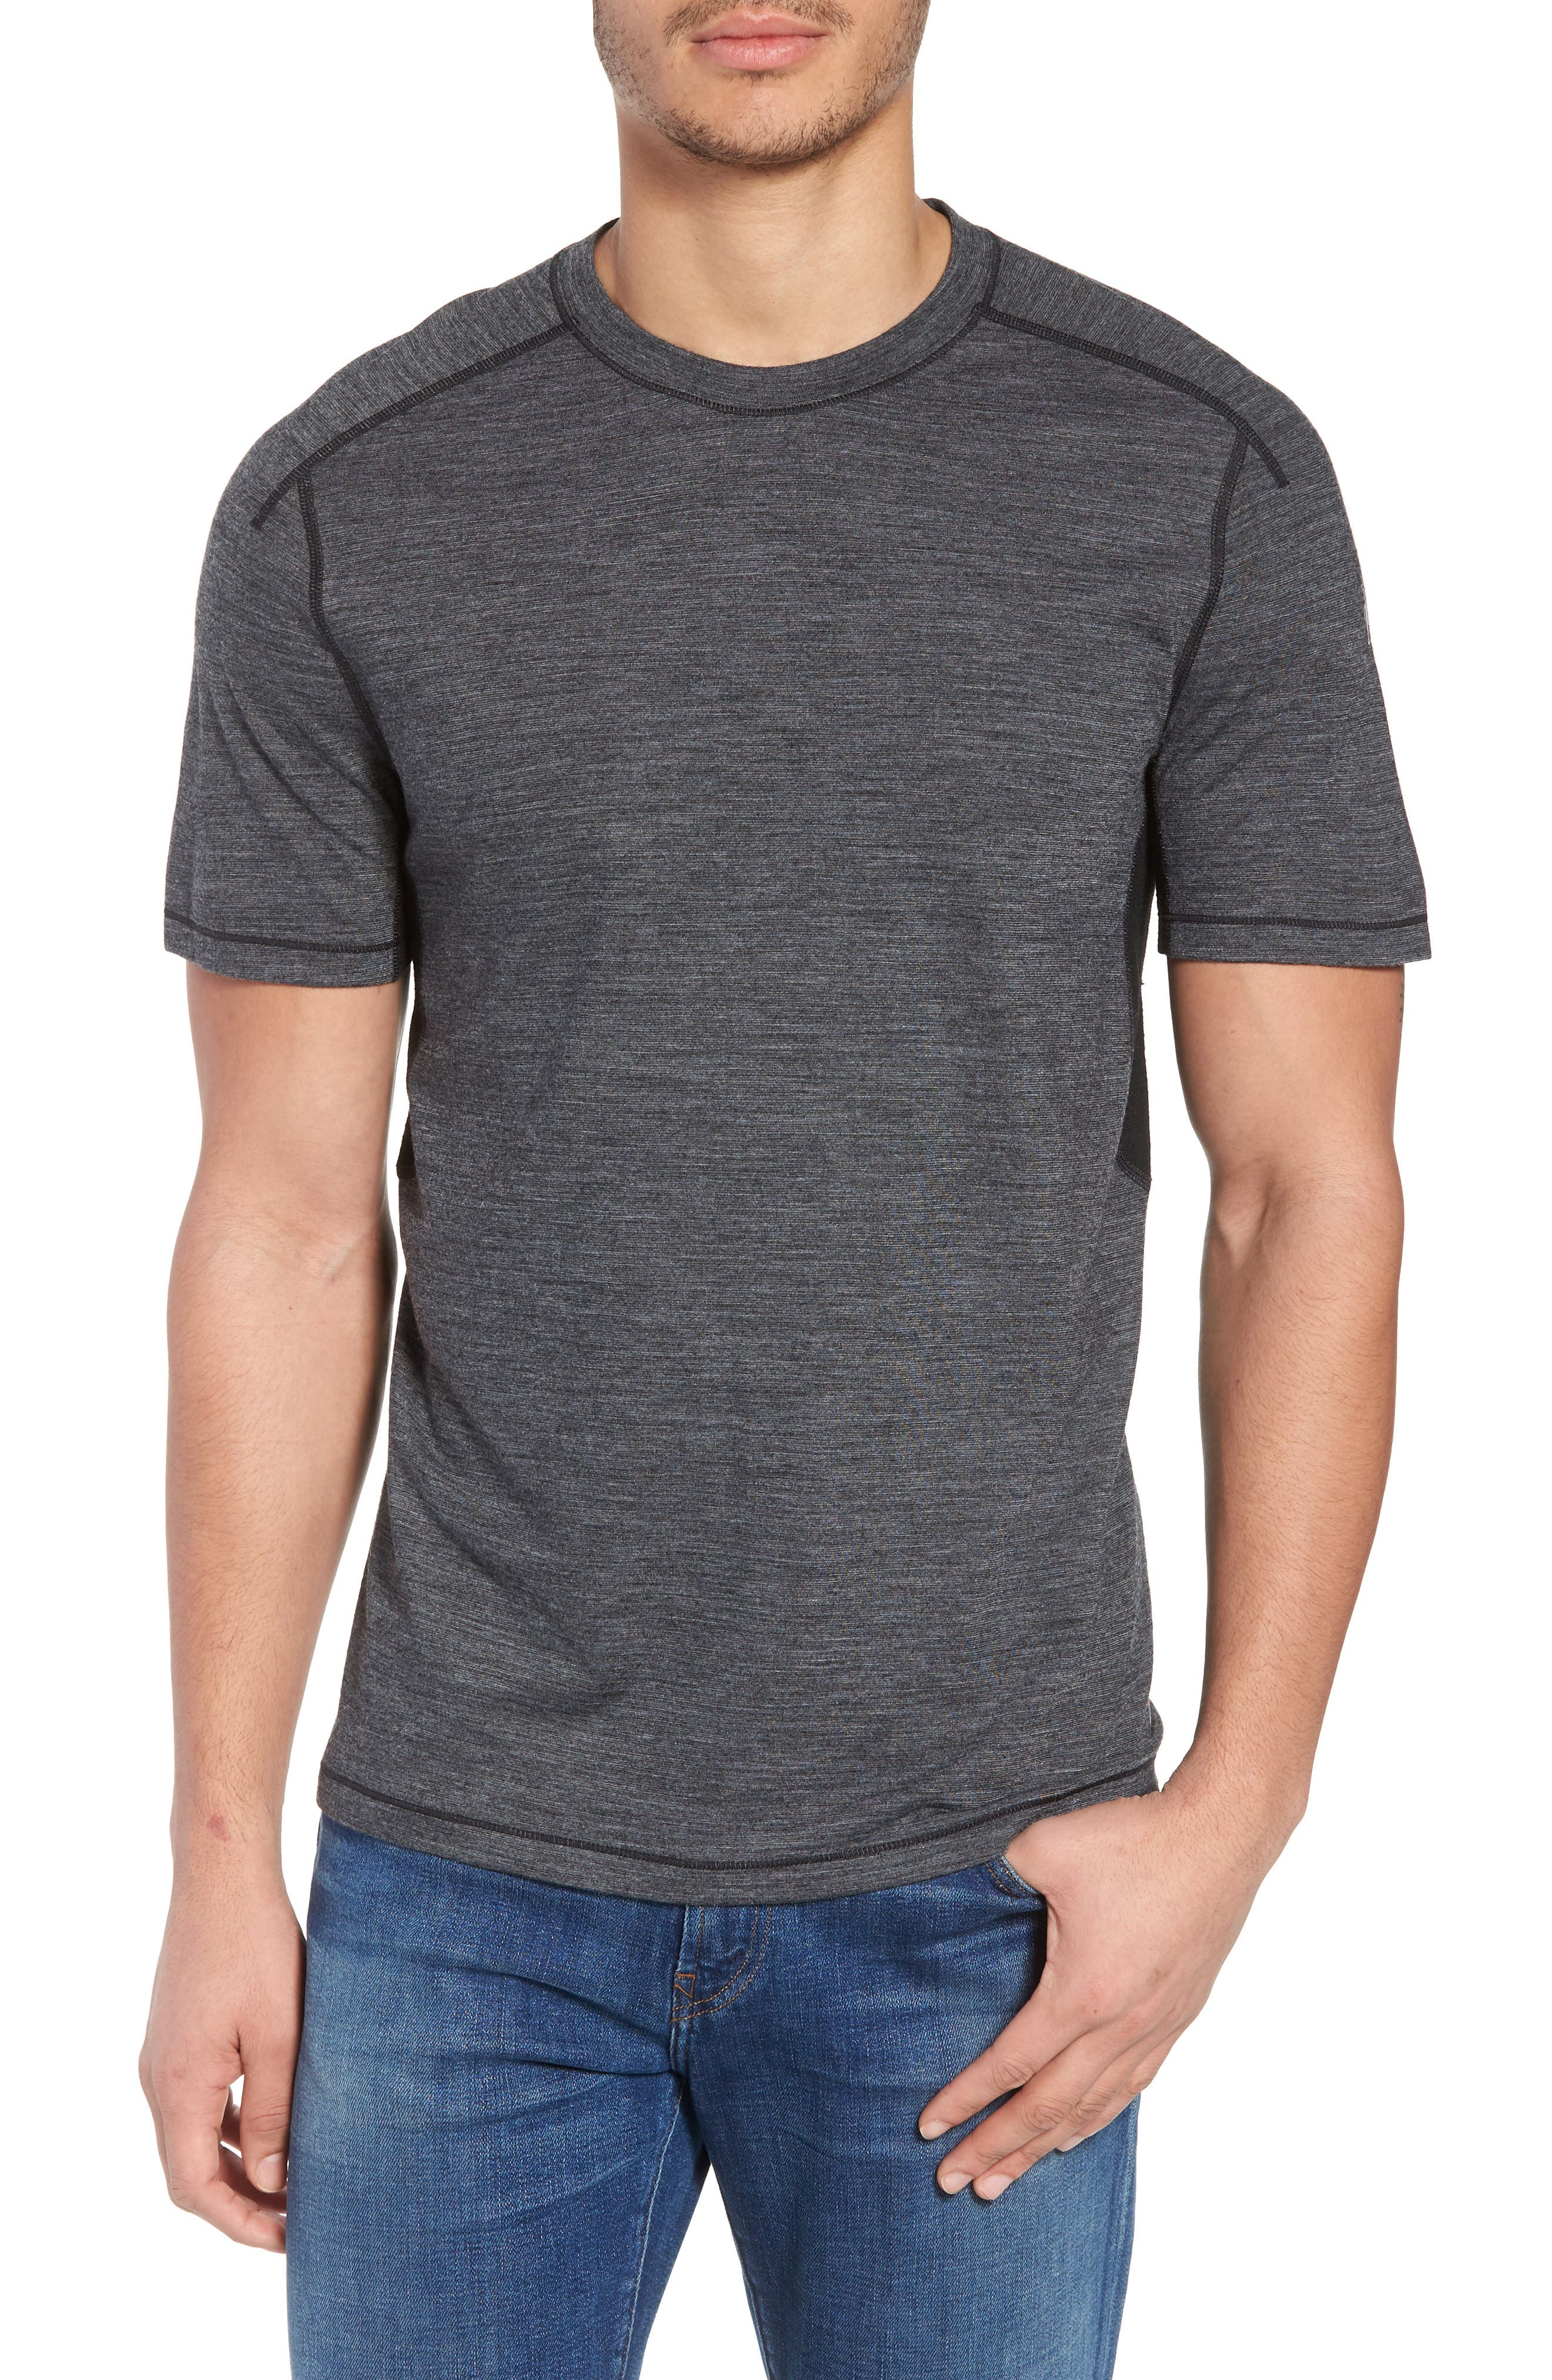 PhD<sup>®</sup> Ultra-Light T-Shirt,                         Main,                         color, 020